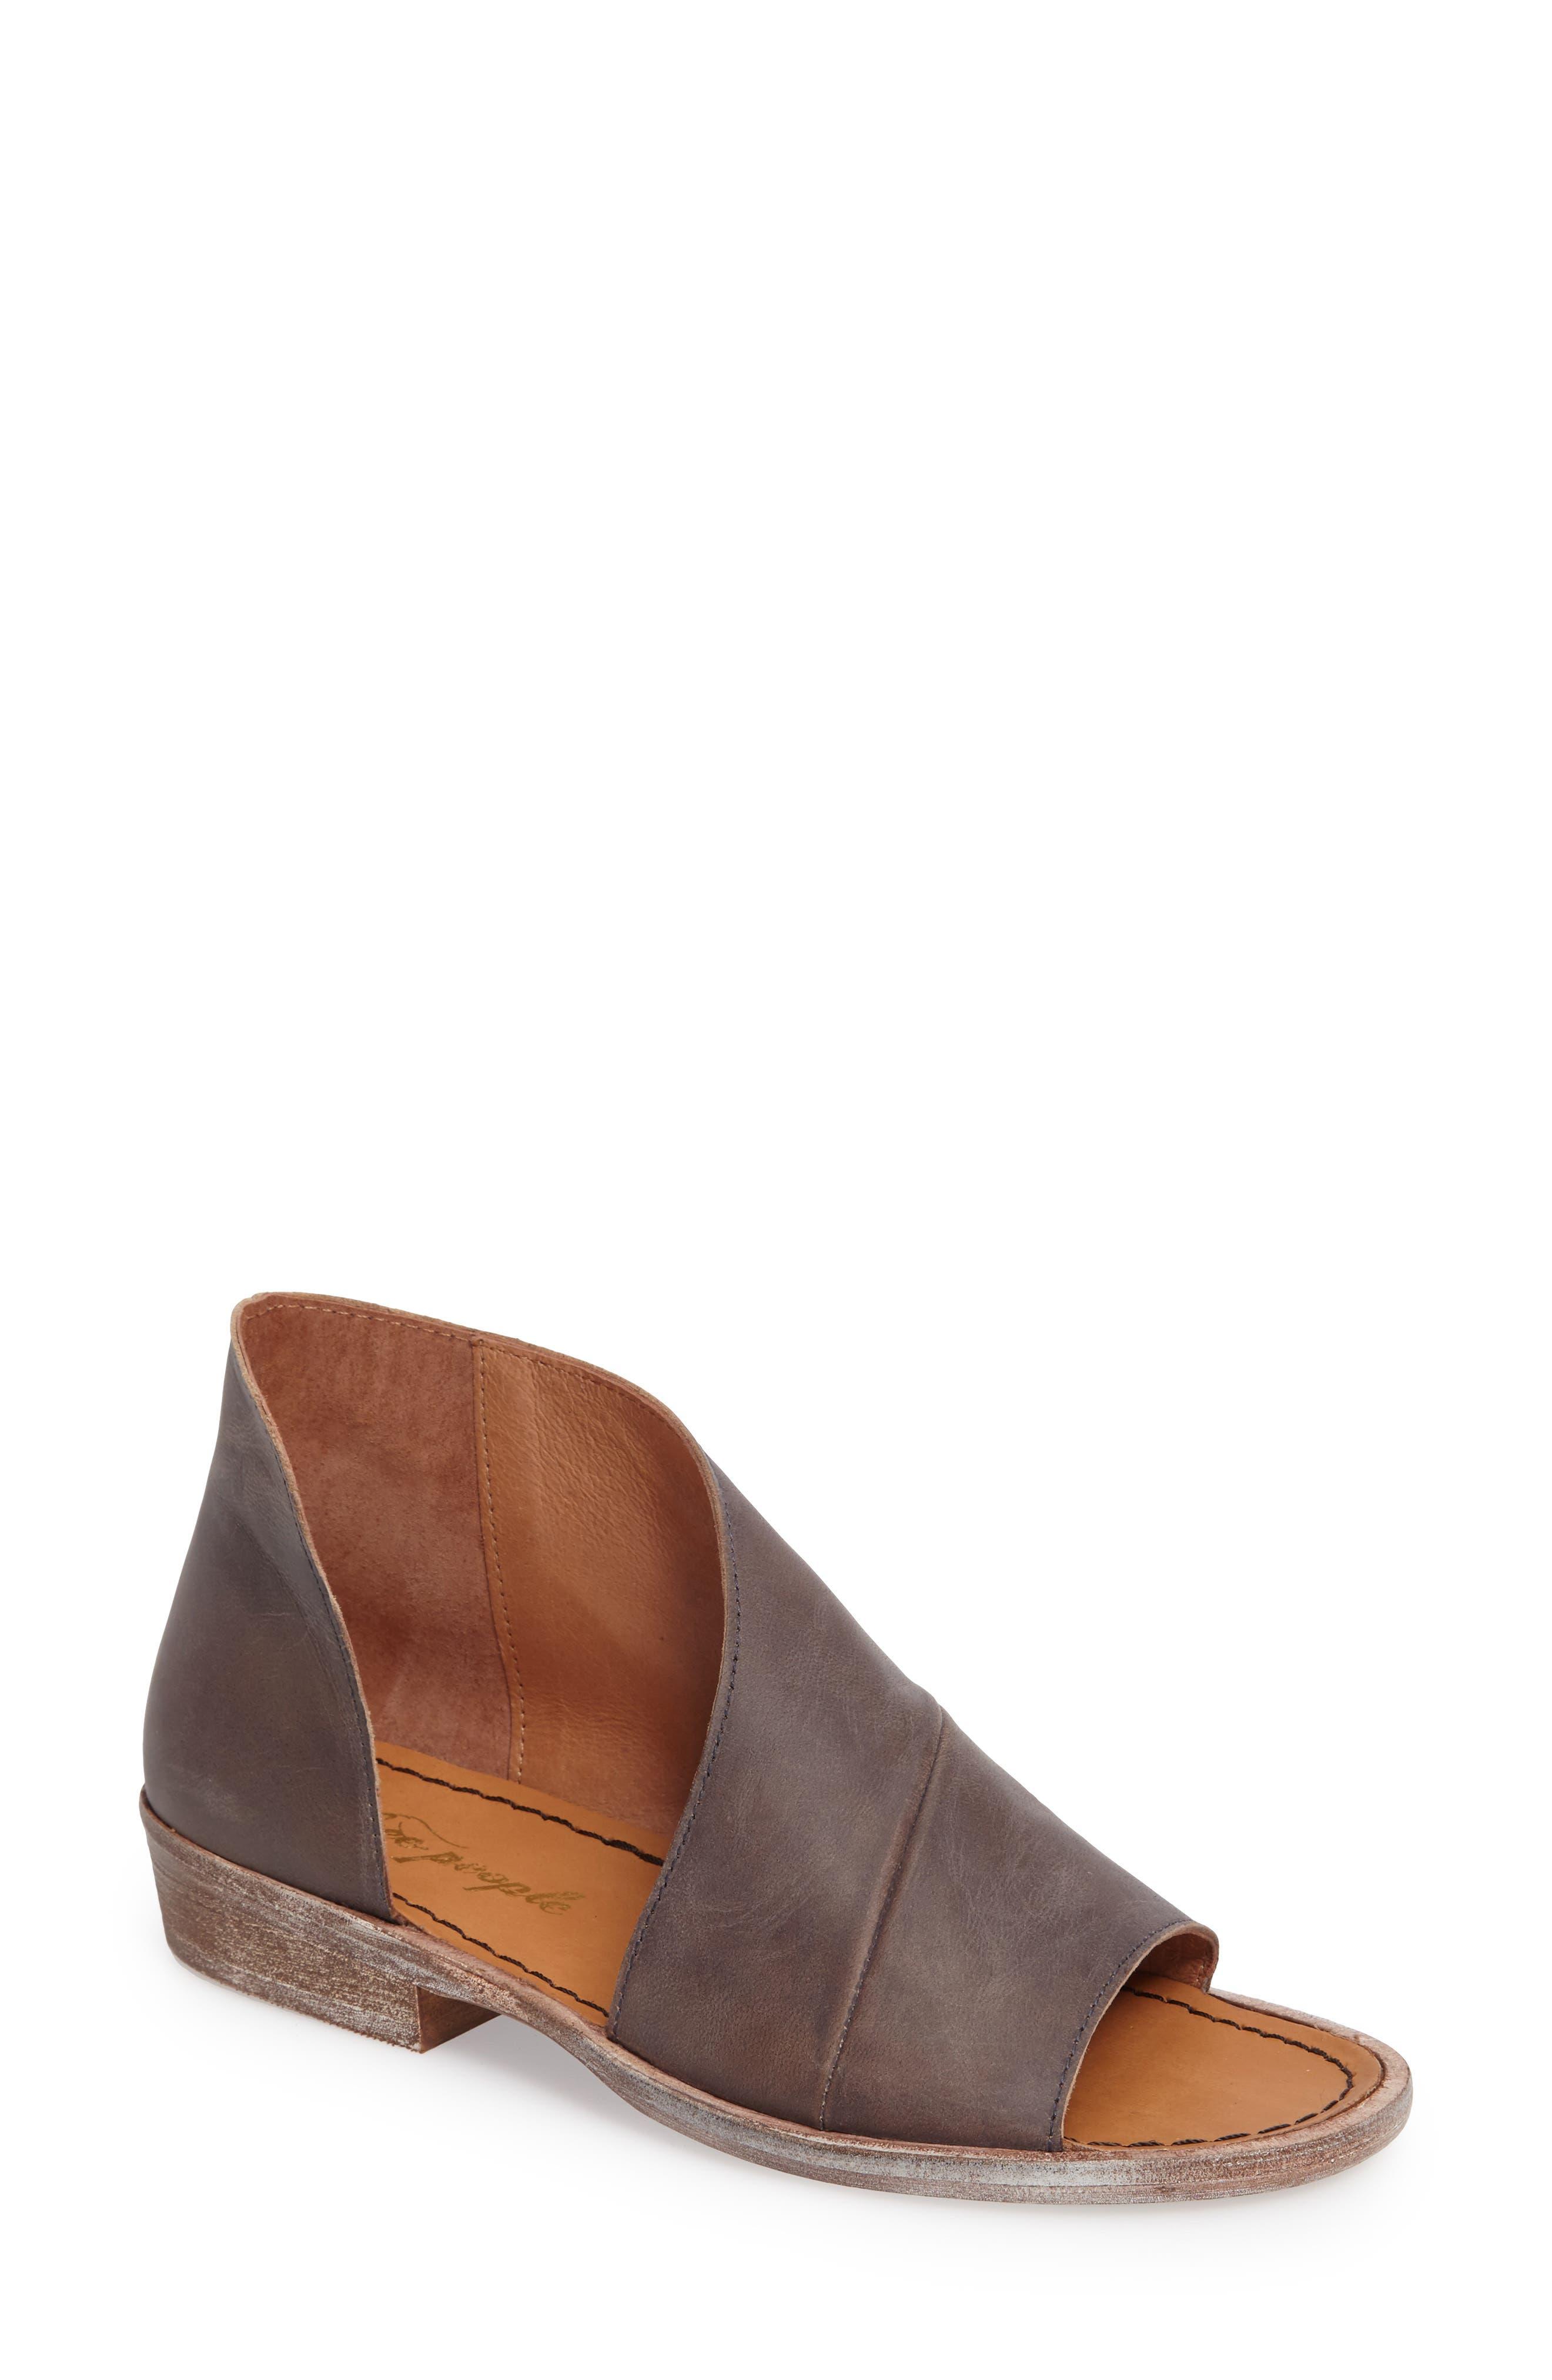 'Mont Blanc' Asymmetrical Sandal,                             Main thumbnail 8, color,